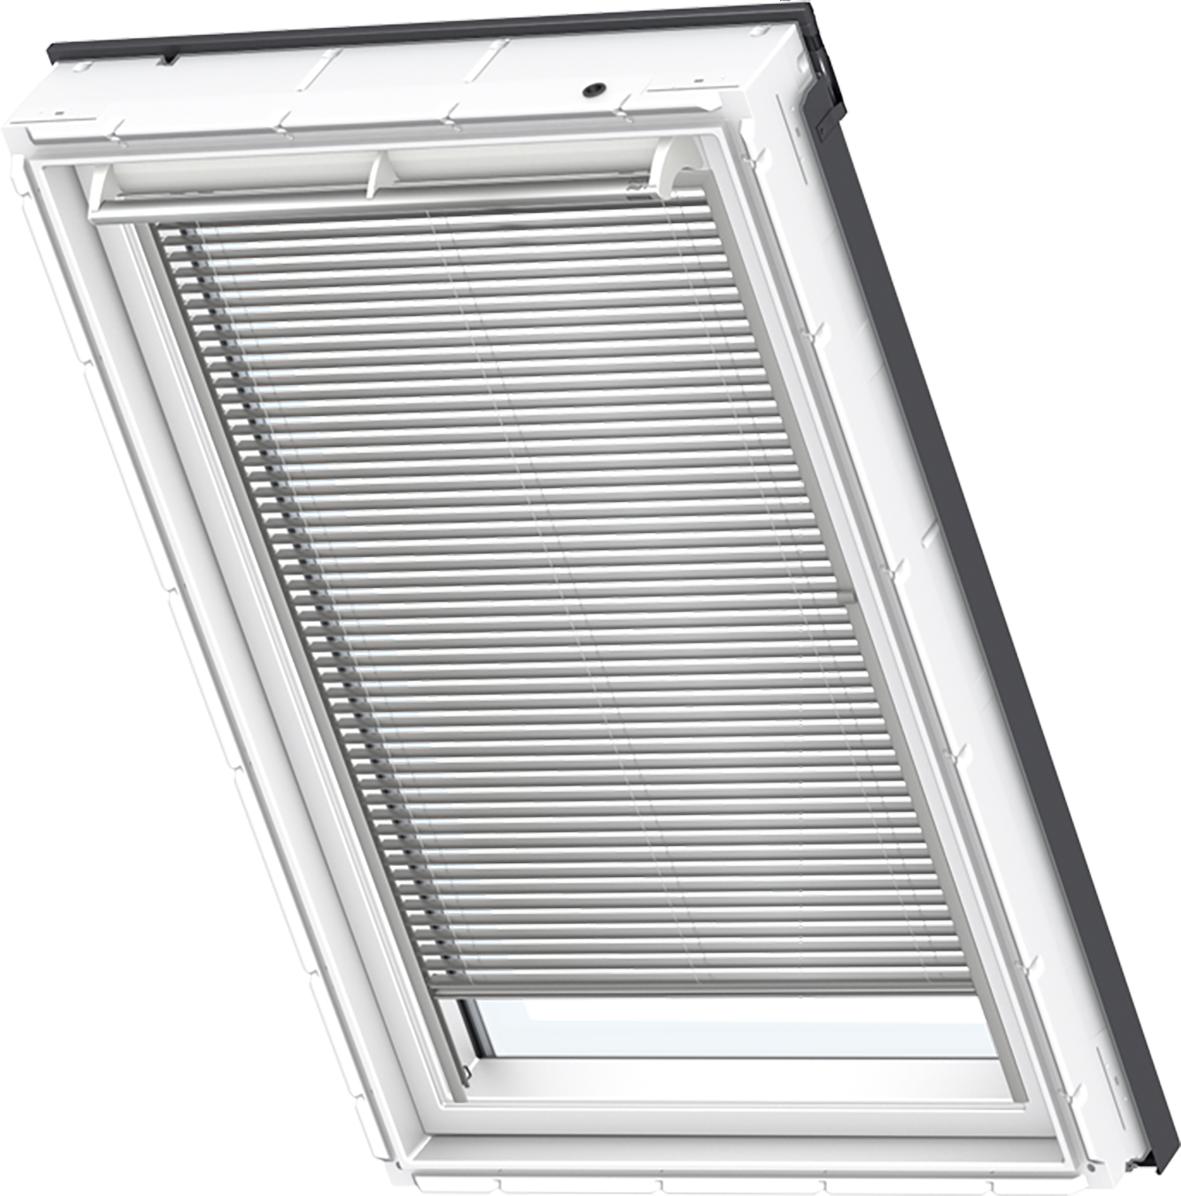 Original VELUX Jalousie für Dachfenster GGU GGU GGU GPU GHU GTU GGL GPL GHL GTL.   New Products  461521